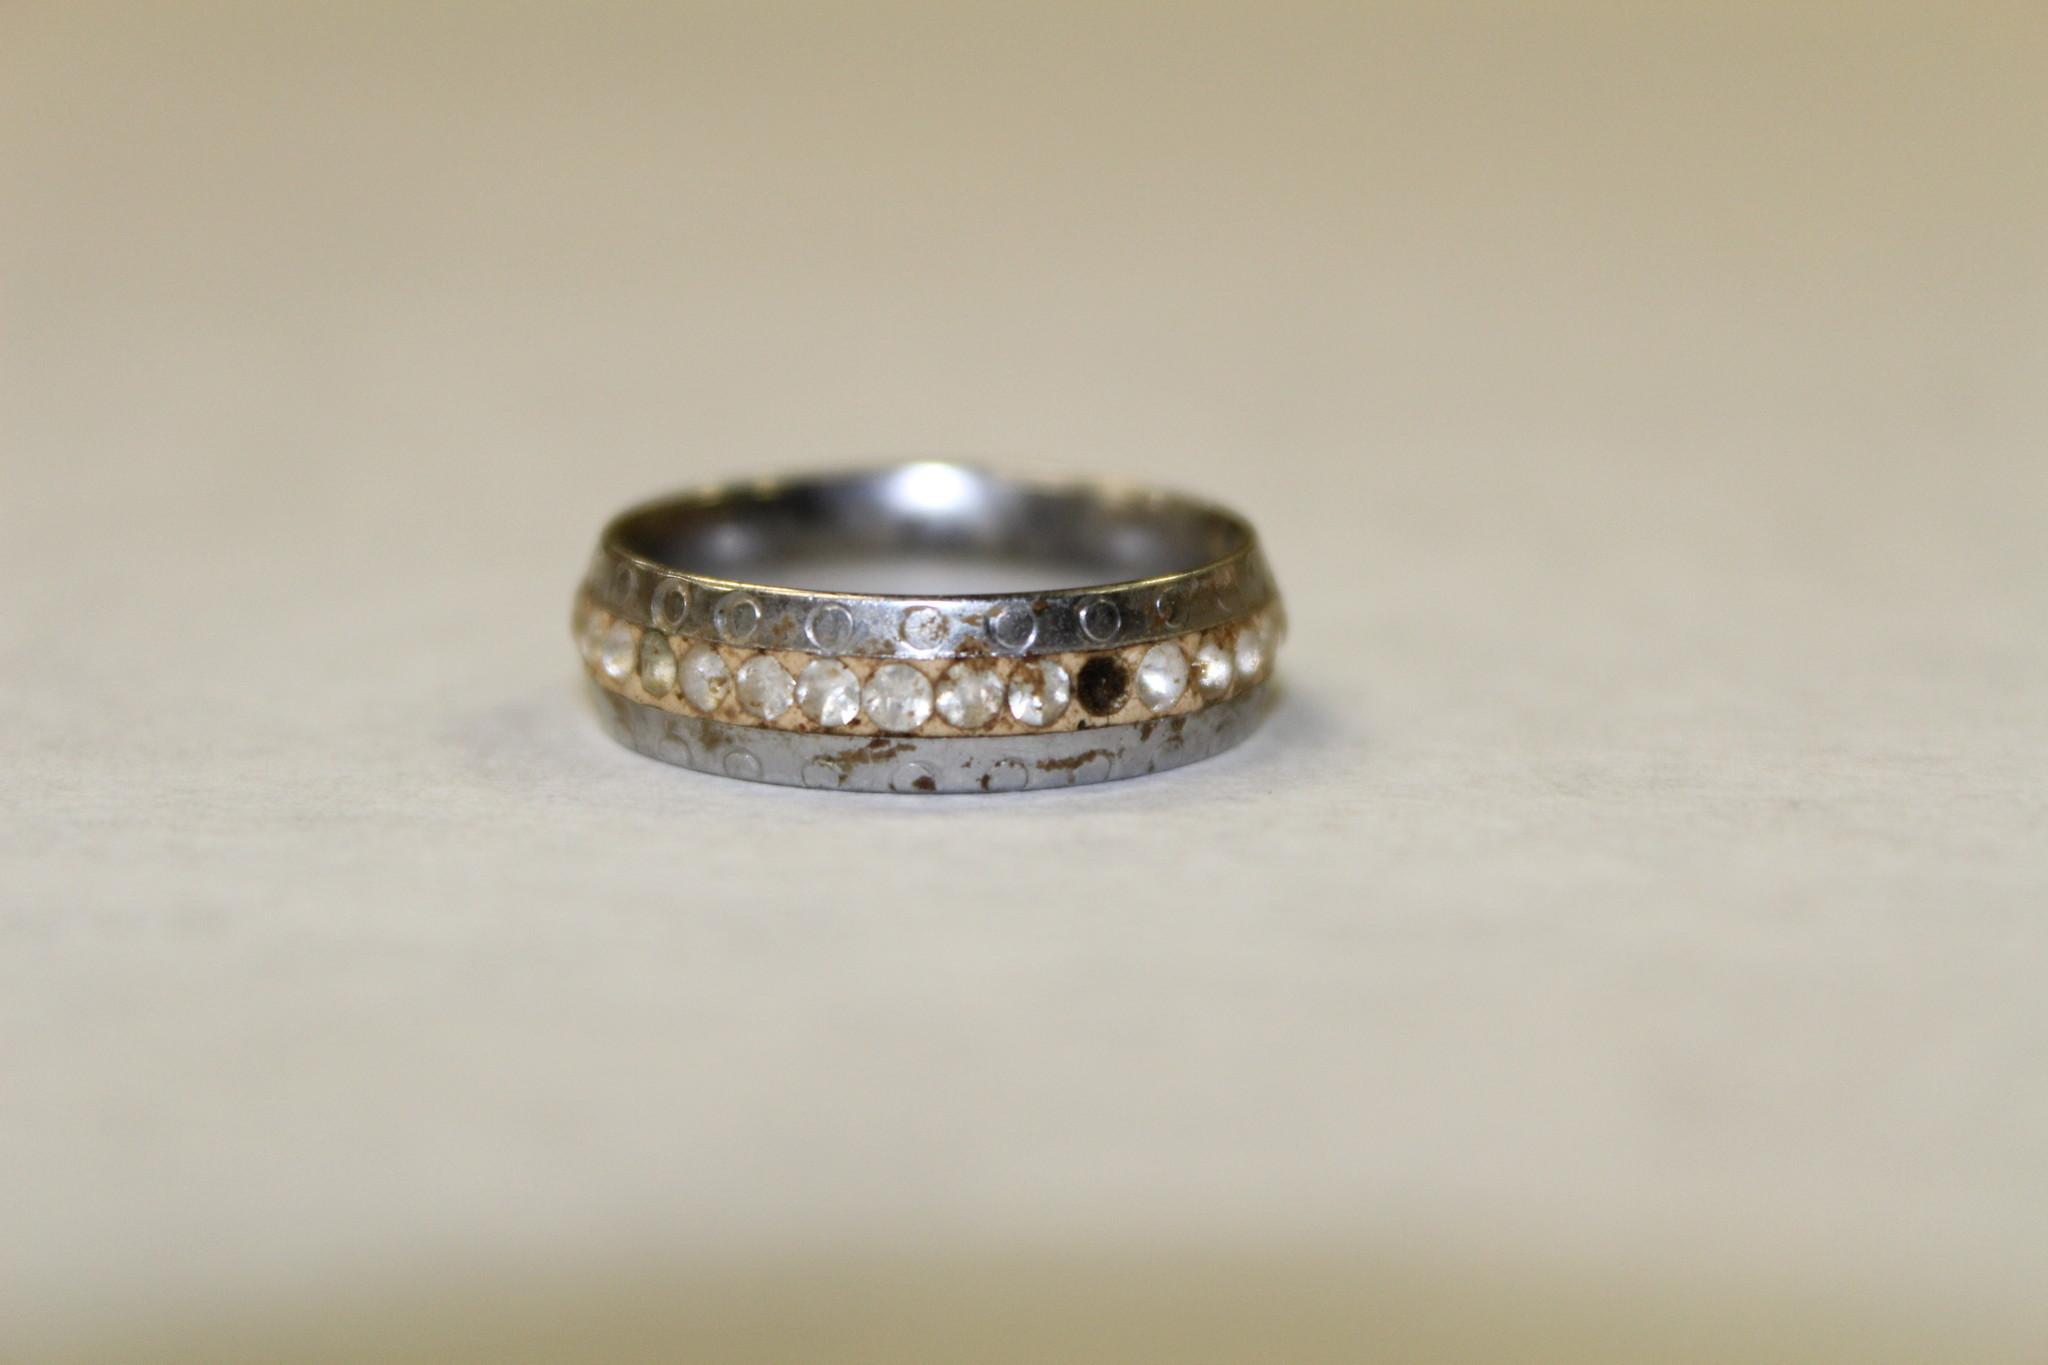 Orlando Wedding Bands 11 Marvelous Investigators hope jewelry reward